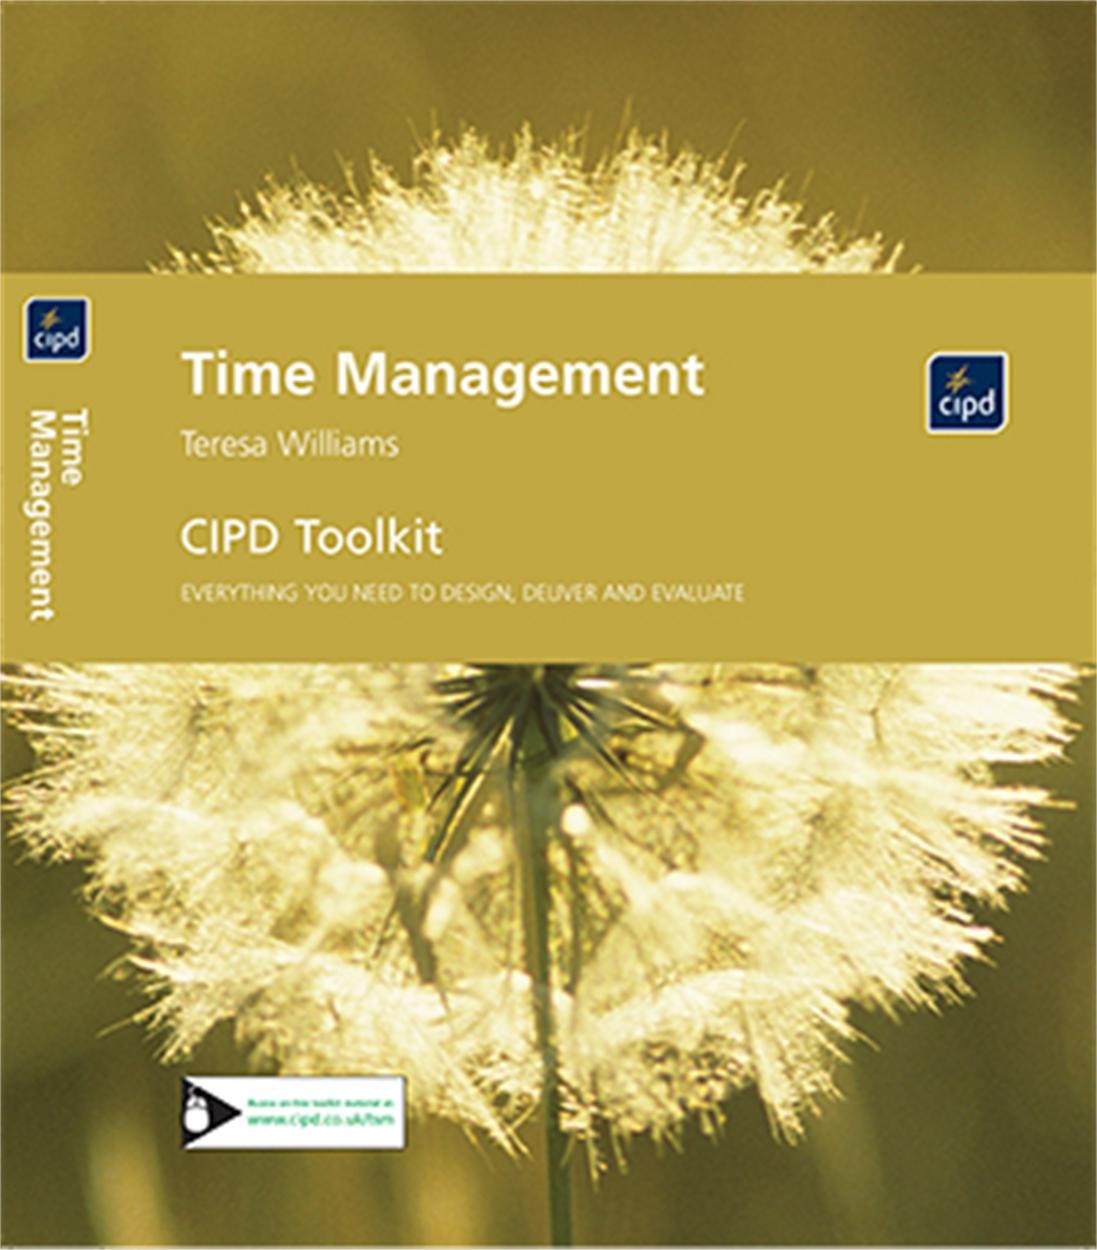 Time Management (9781843982159)